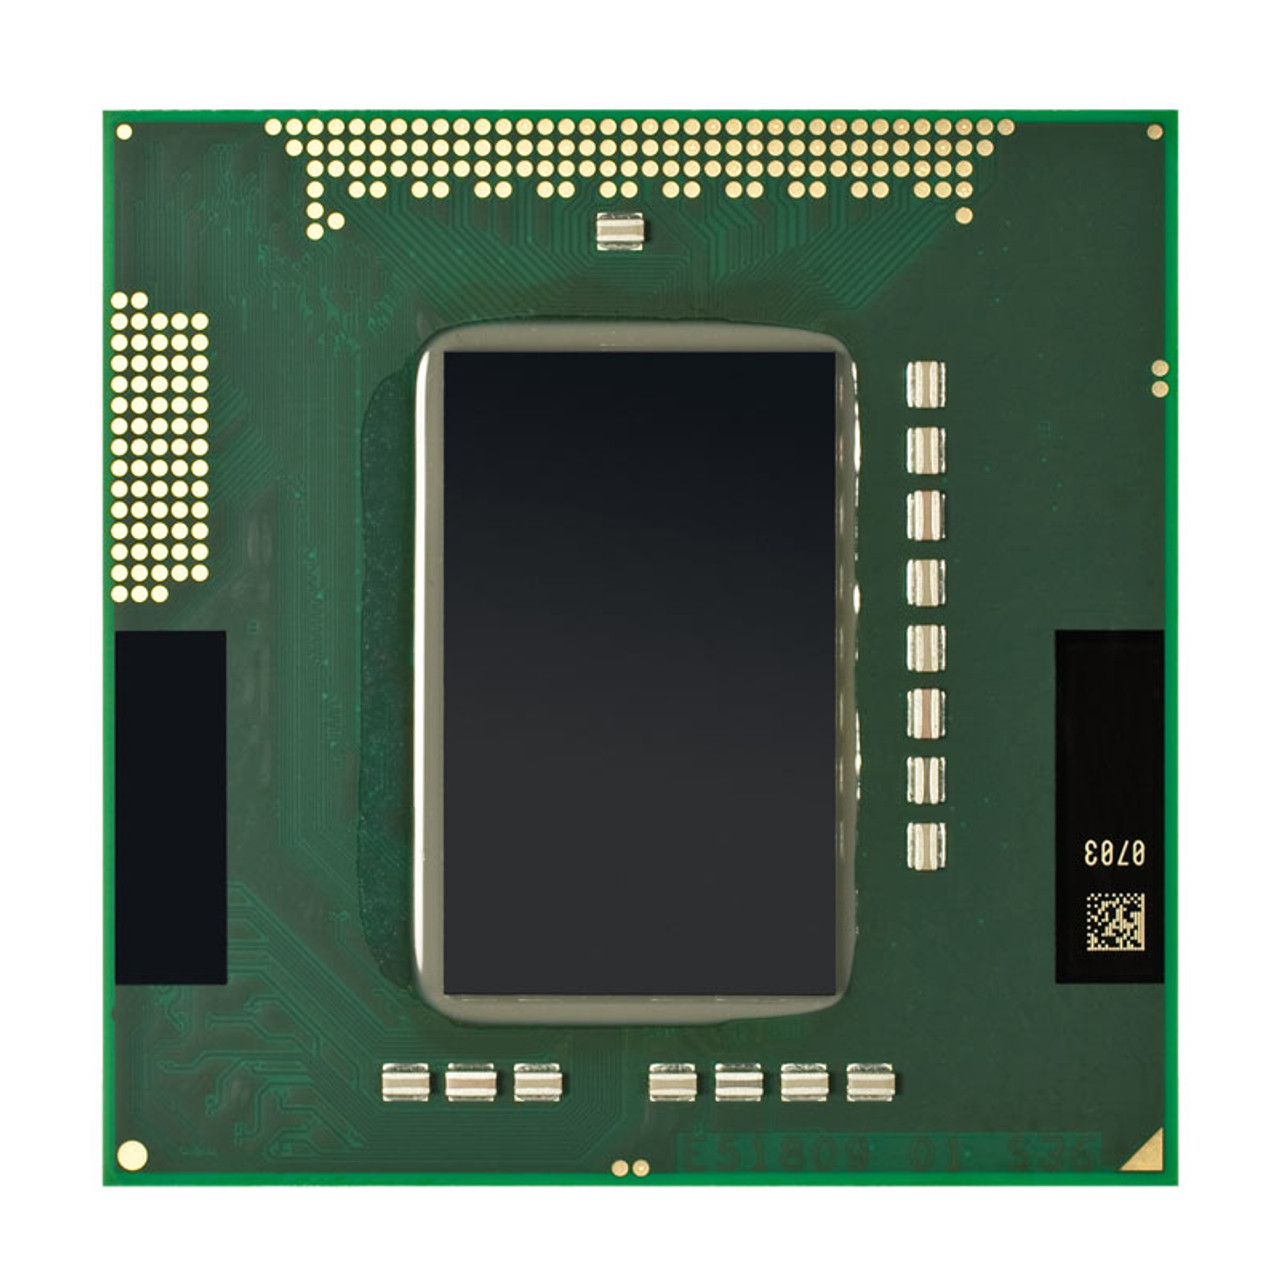 Intel Core i7-620M 2.66GHz Dual Core SLBTQ